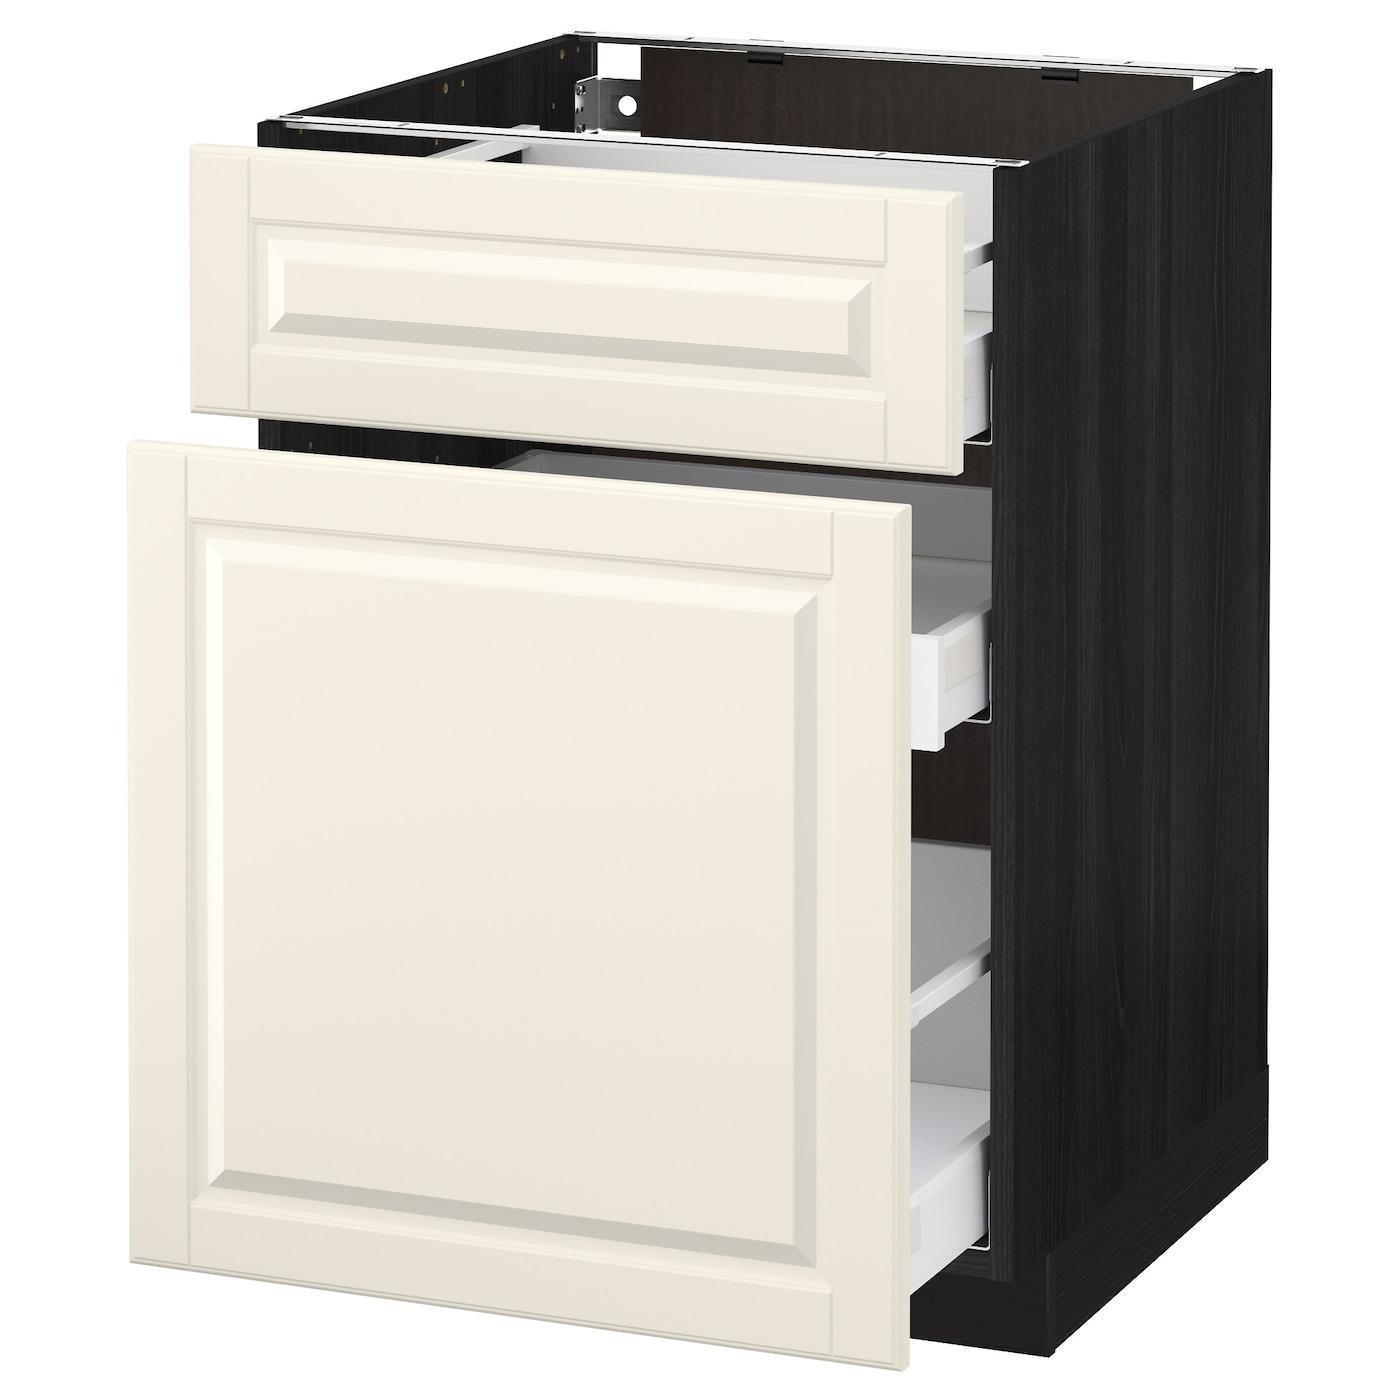 Ikea Kitchen Black Cabinets: METOD/MAXIMERA Base Cabinet/p-out Storage/drawer Black/bodbyn Off-white 60 X 60 Cm